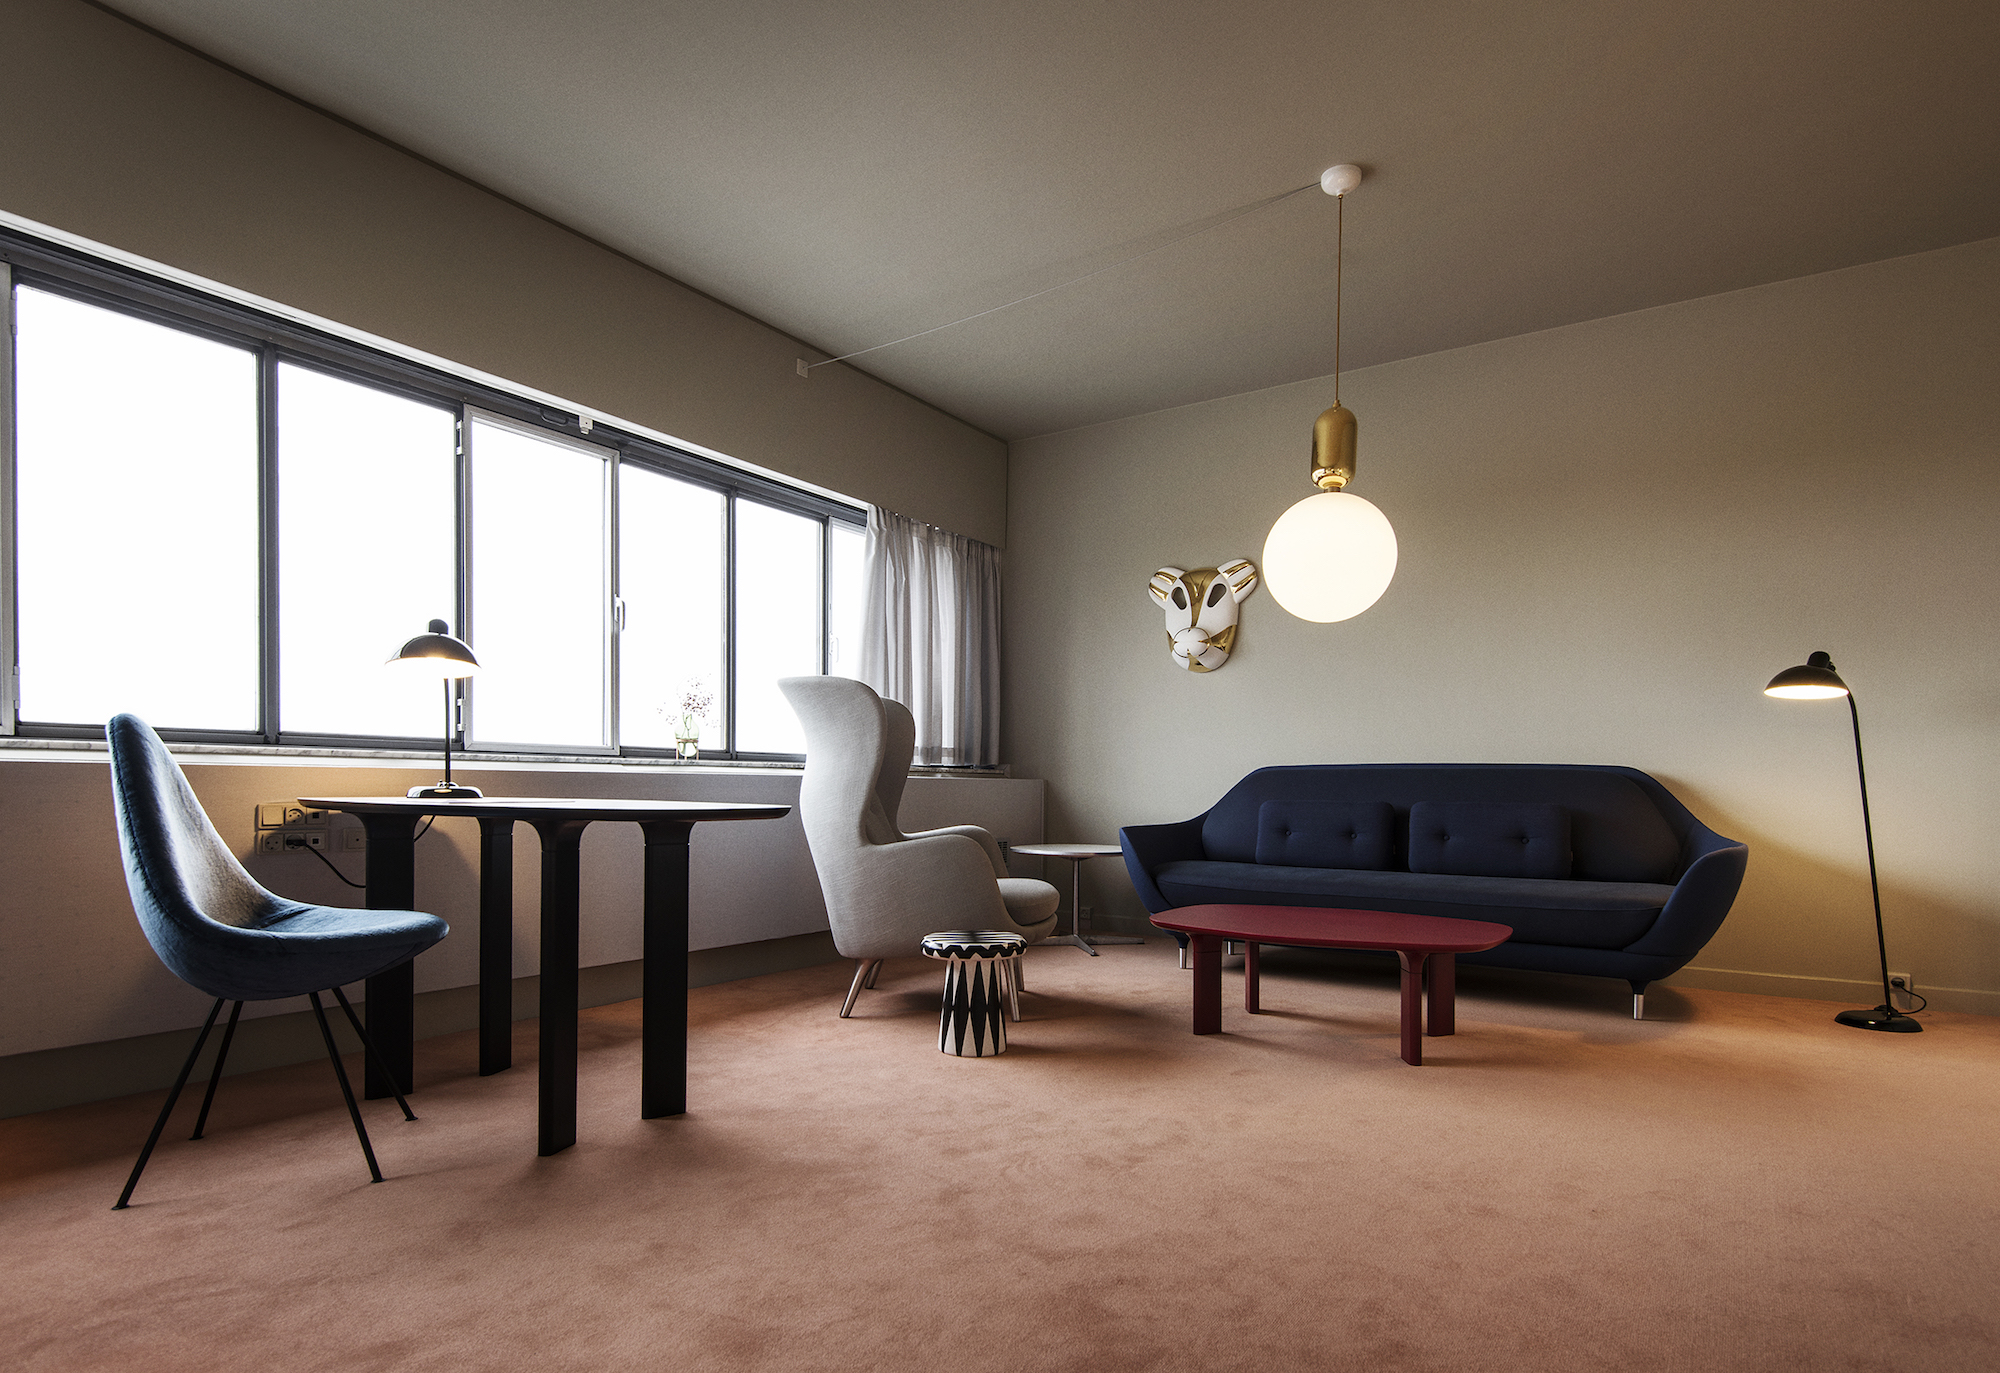 Room 506, designed by Jaime Hayon, at the Radisson Blu Royal Hotel in Copenhagen